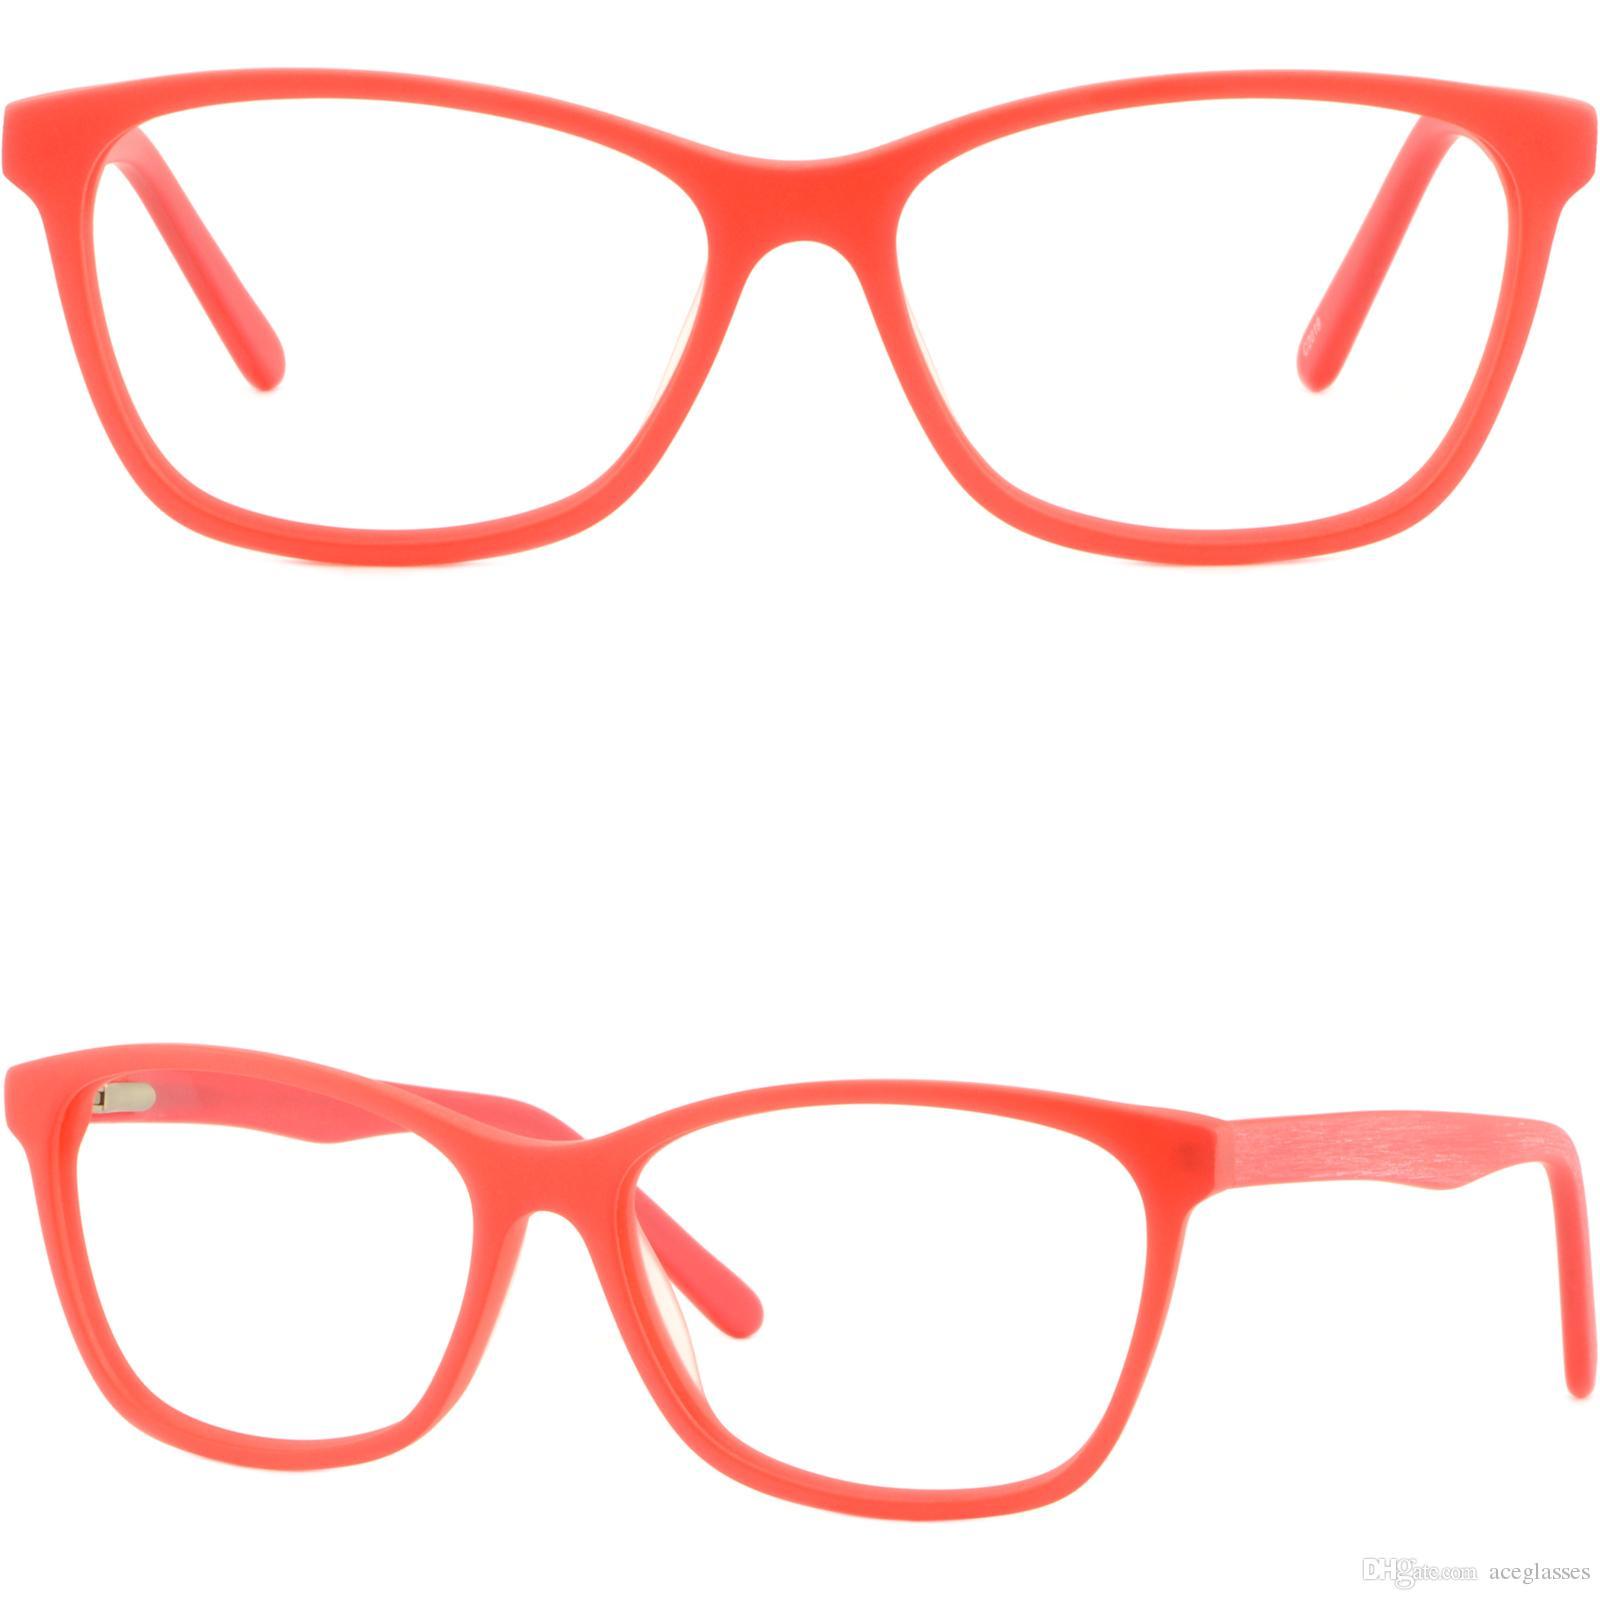 567780e7b225 Red Women S Acetate Frames Spring Hinges Light Prescription Glasses. Armourx  Prescription Safety Glasses Plastic Frame Ax 7001 Only